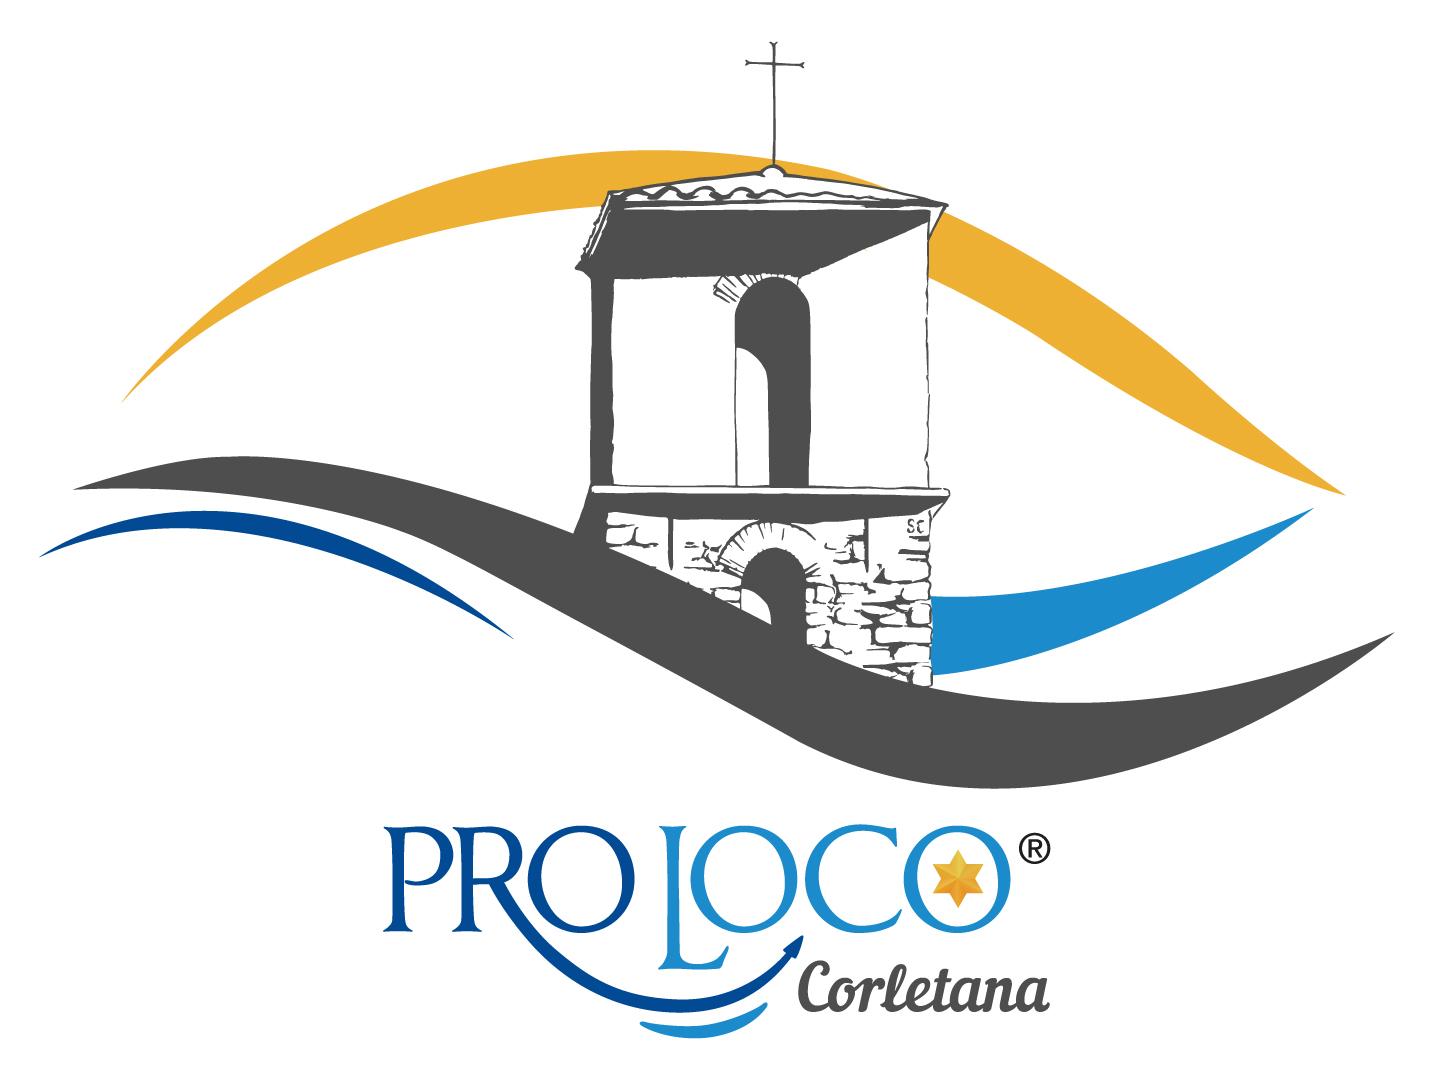 Pro Loco Corletana